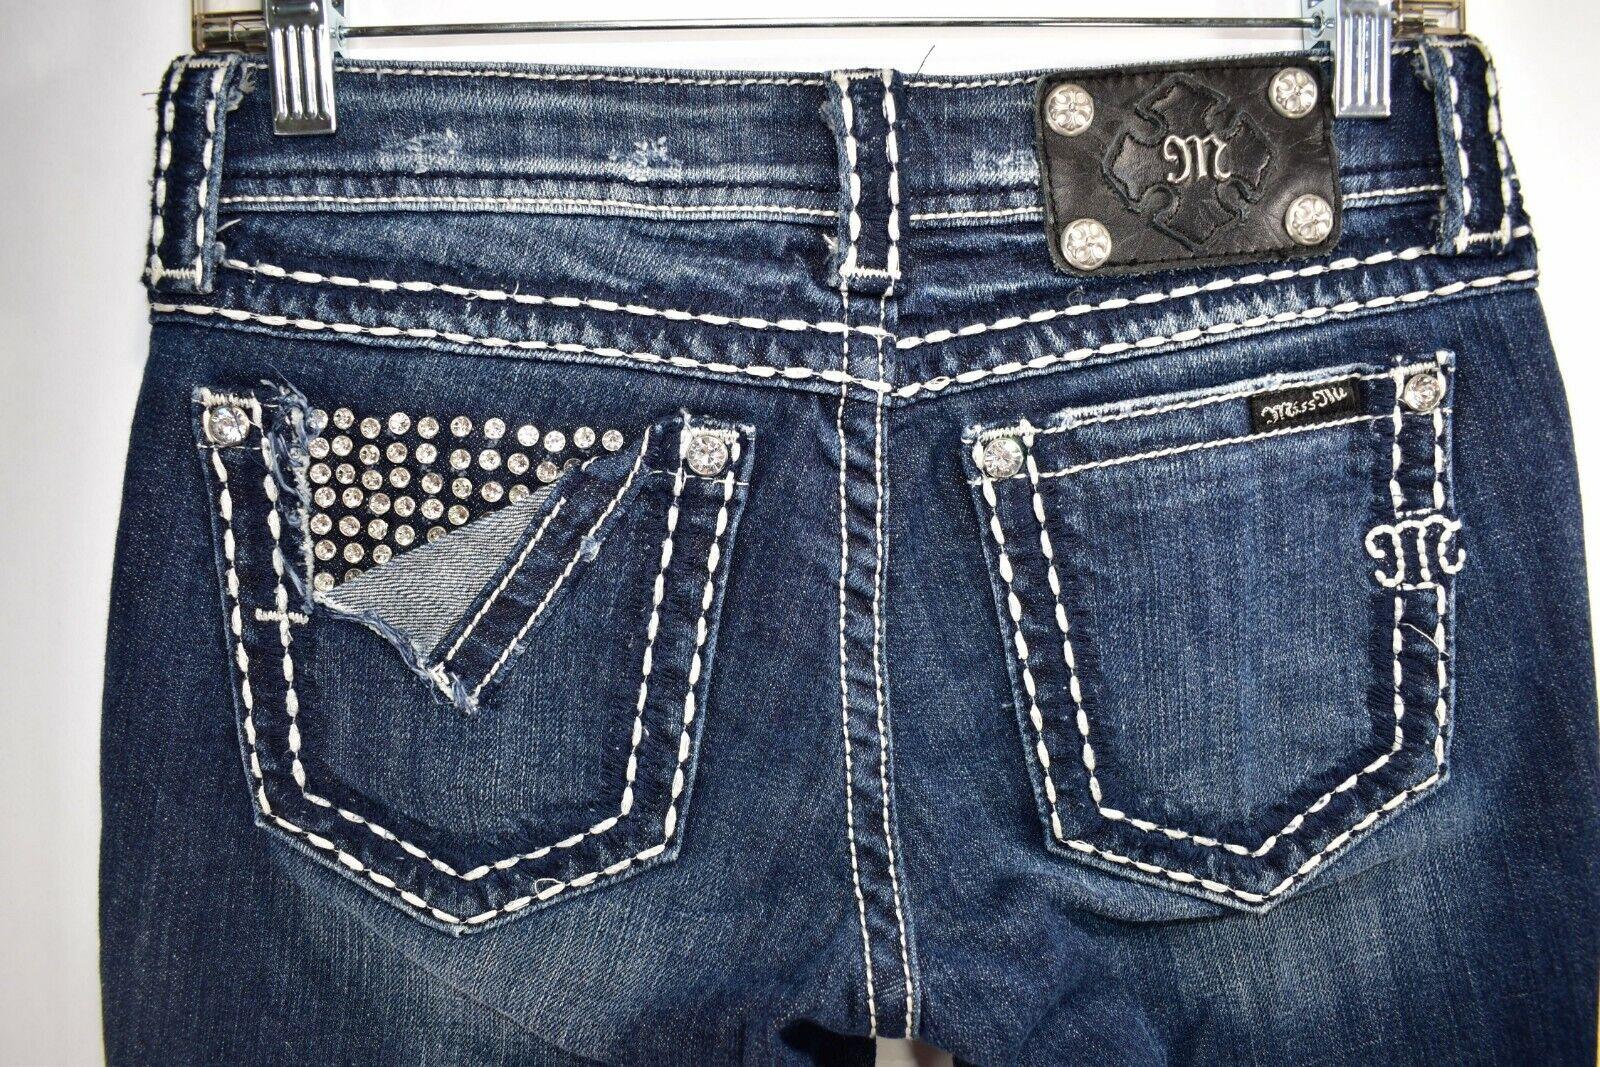 Miss Me Jeans Skinny Stretch Rhinestones Peek Tag Size 27x31 Womens Meas. 28x31